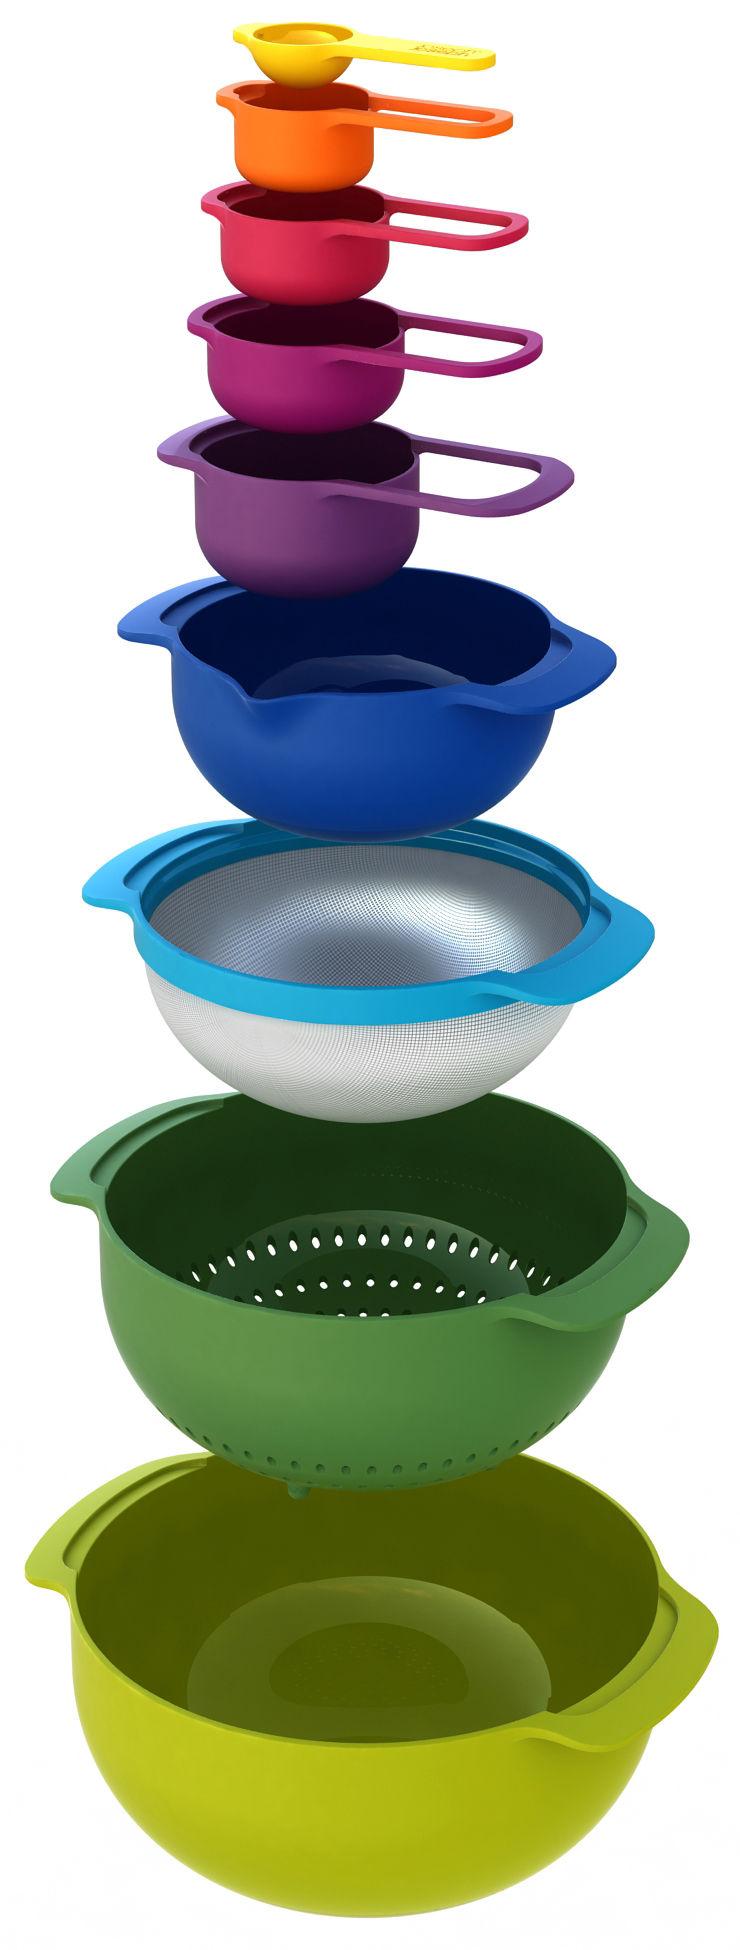 Tischkultur - Salatschüsseln und Schalen - Nest Plus Salatschüssel / Sieb & Messlöffel - Set aus 9 stapelbaren Teilen - Joseph Joseph - Mehrfarbig - Polypropylen, rostfreier Stahl